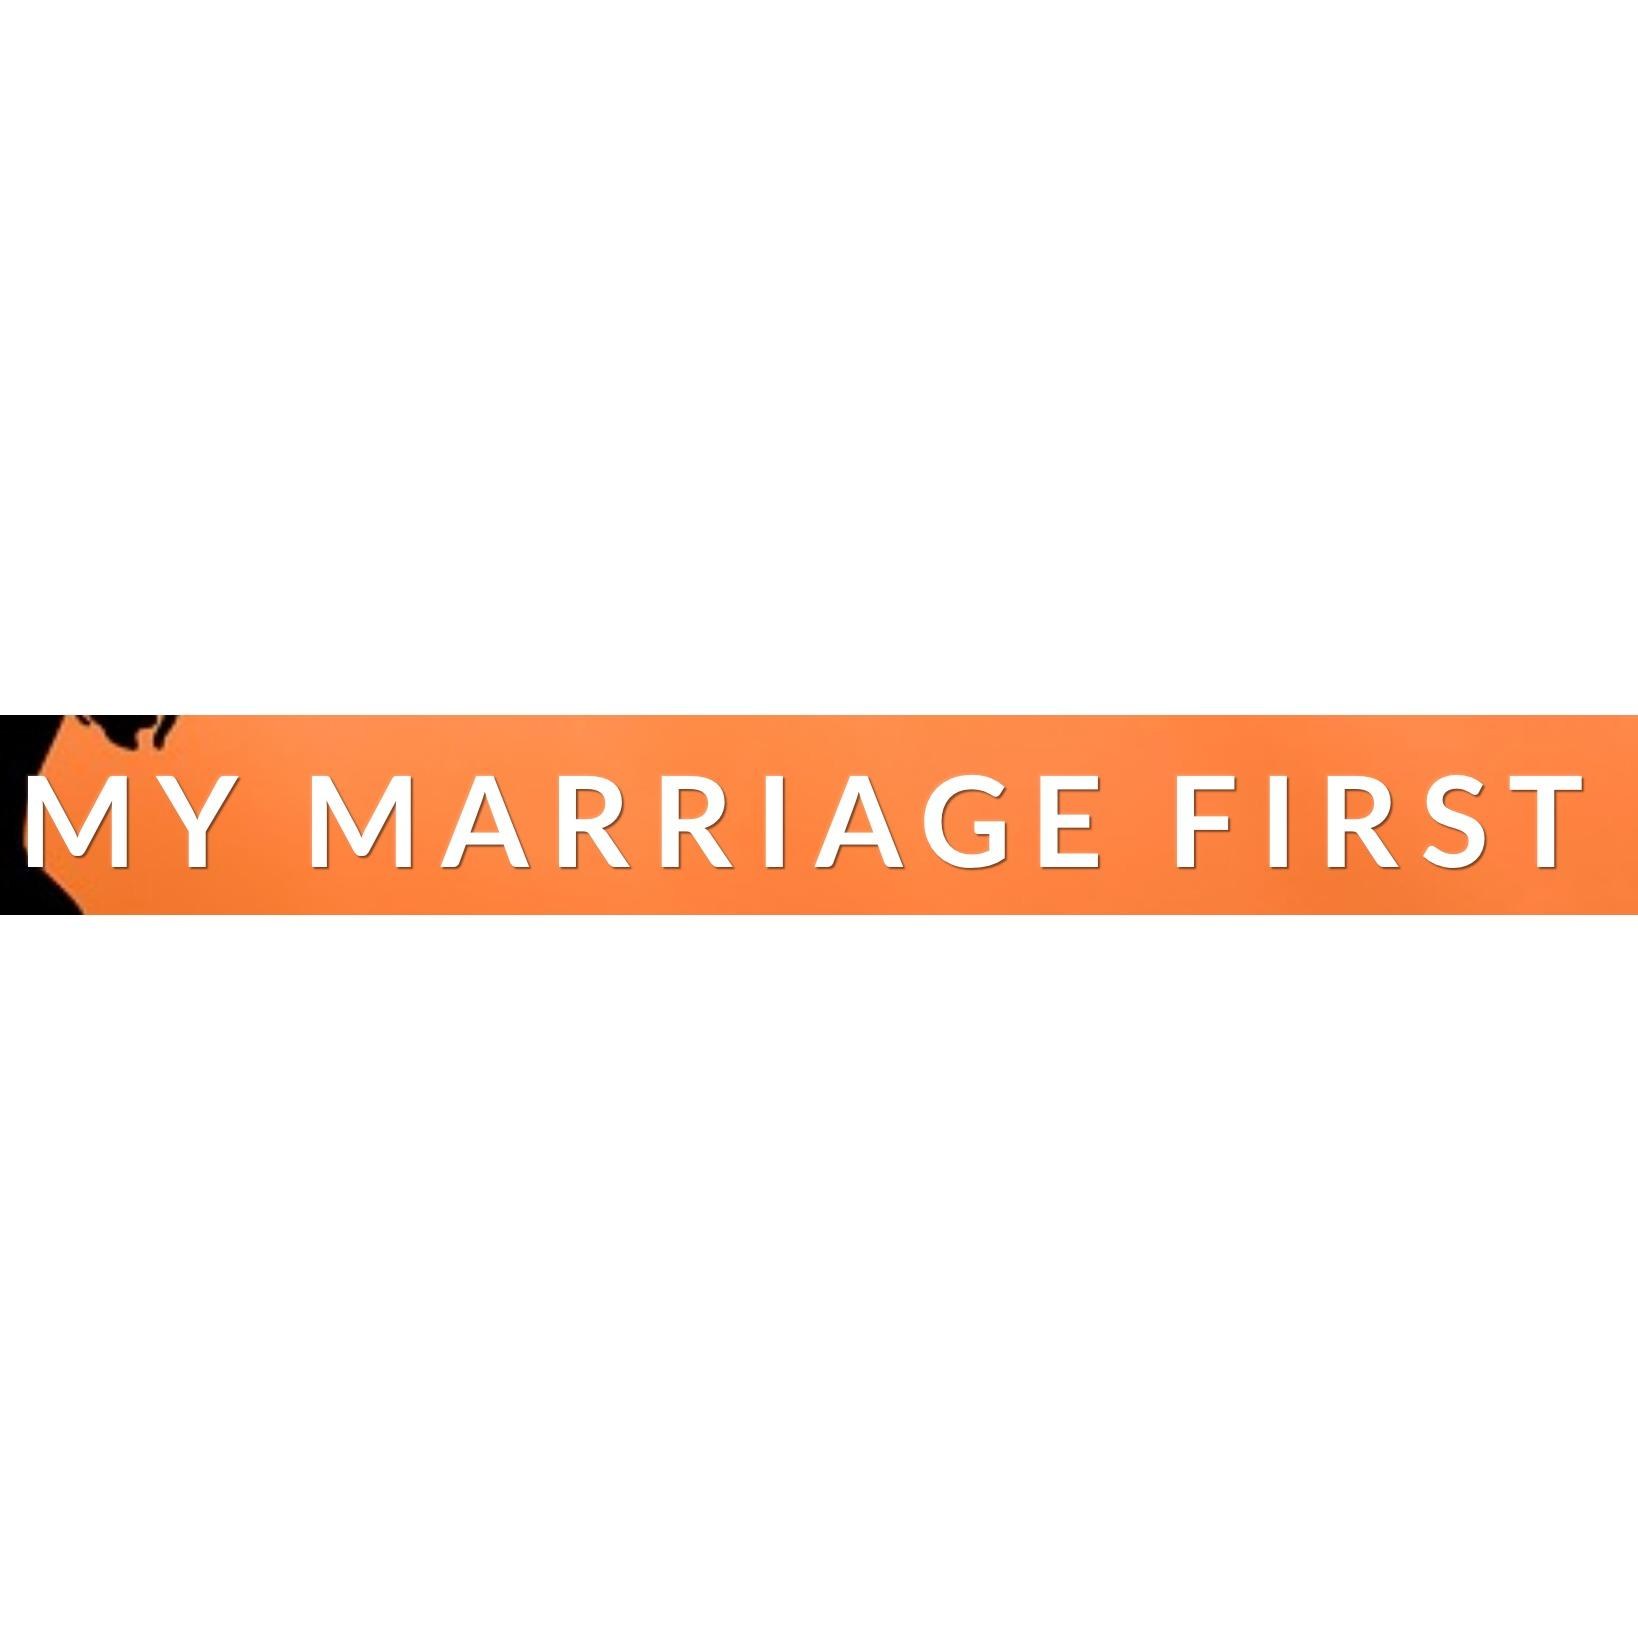 My Marriage First - Omaha, NE 68144 - (402)657-6491 | ShowMeLocal.com